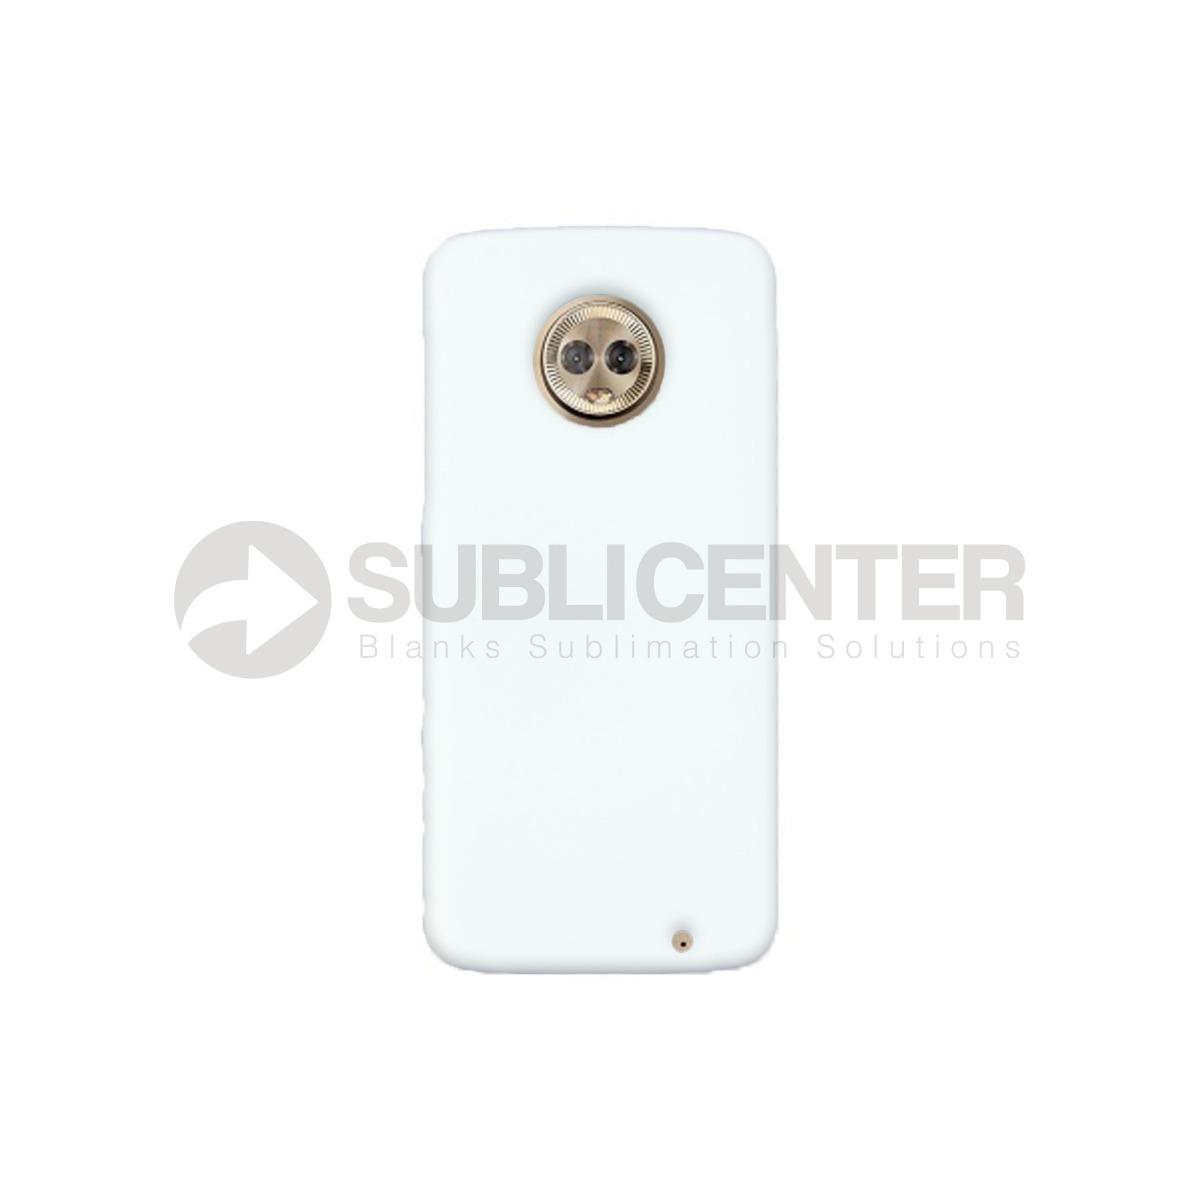 e5a7bbd3c64 Fundas Para Celular 3d Sublimable Motorola G6 Plus - $ 55.00 en ...